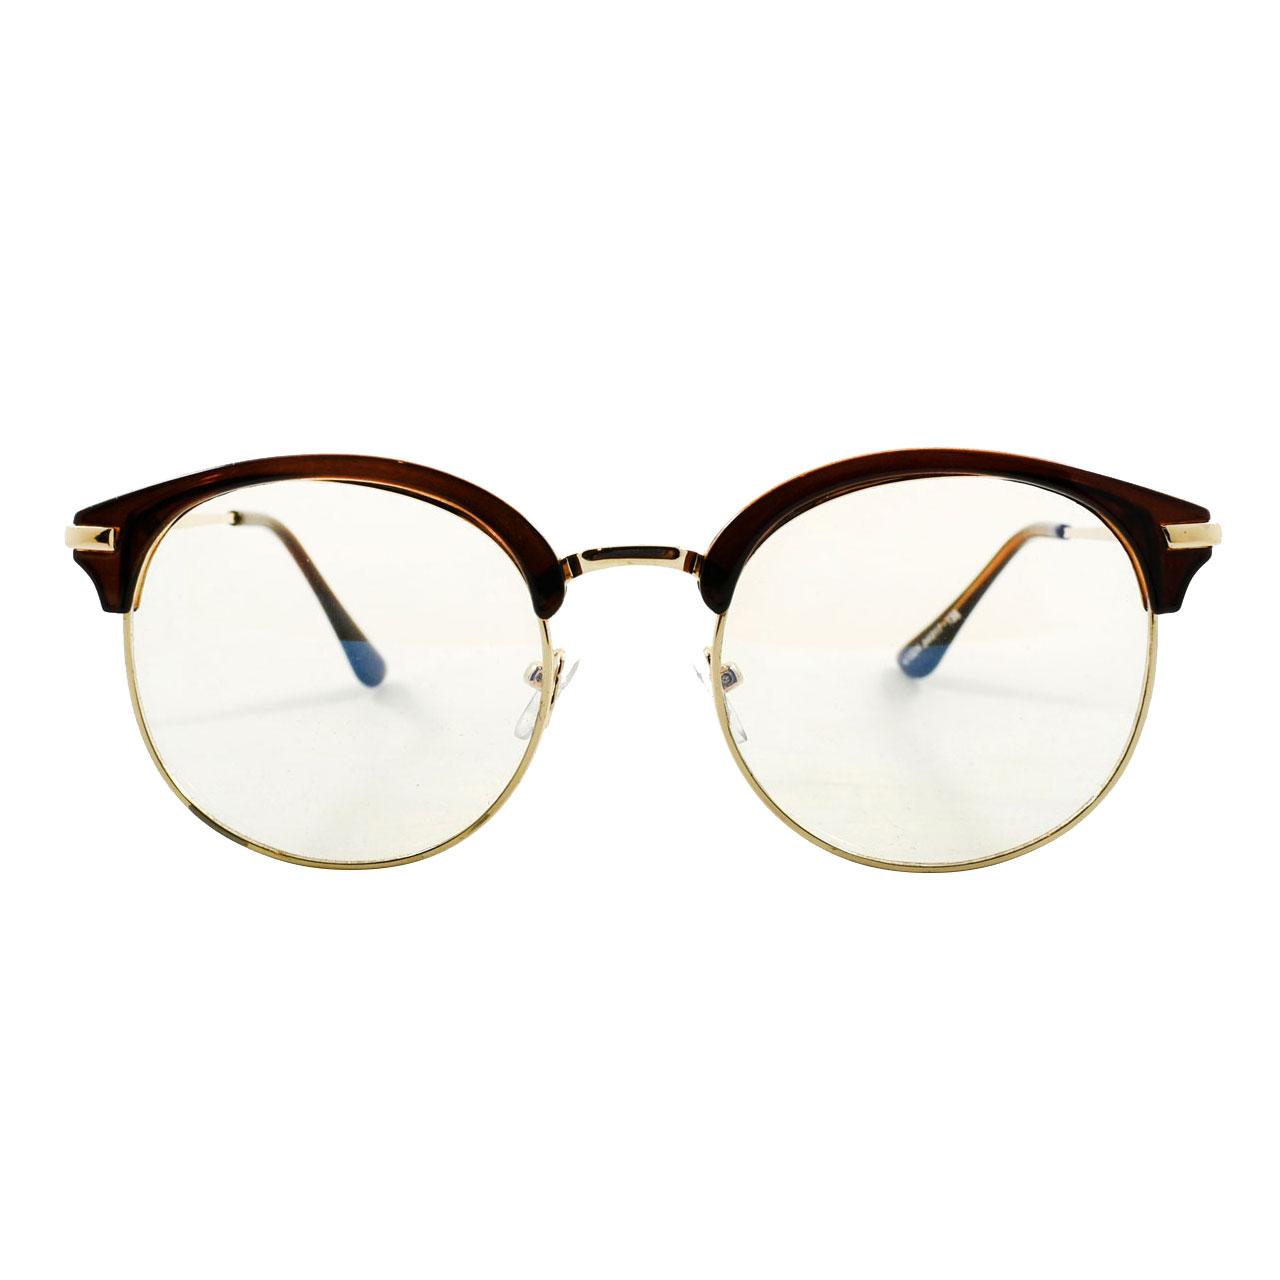 قیمت فریم عینک طبی مدل Mountain Round Metal